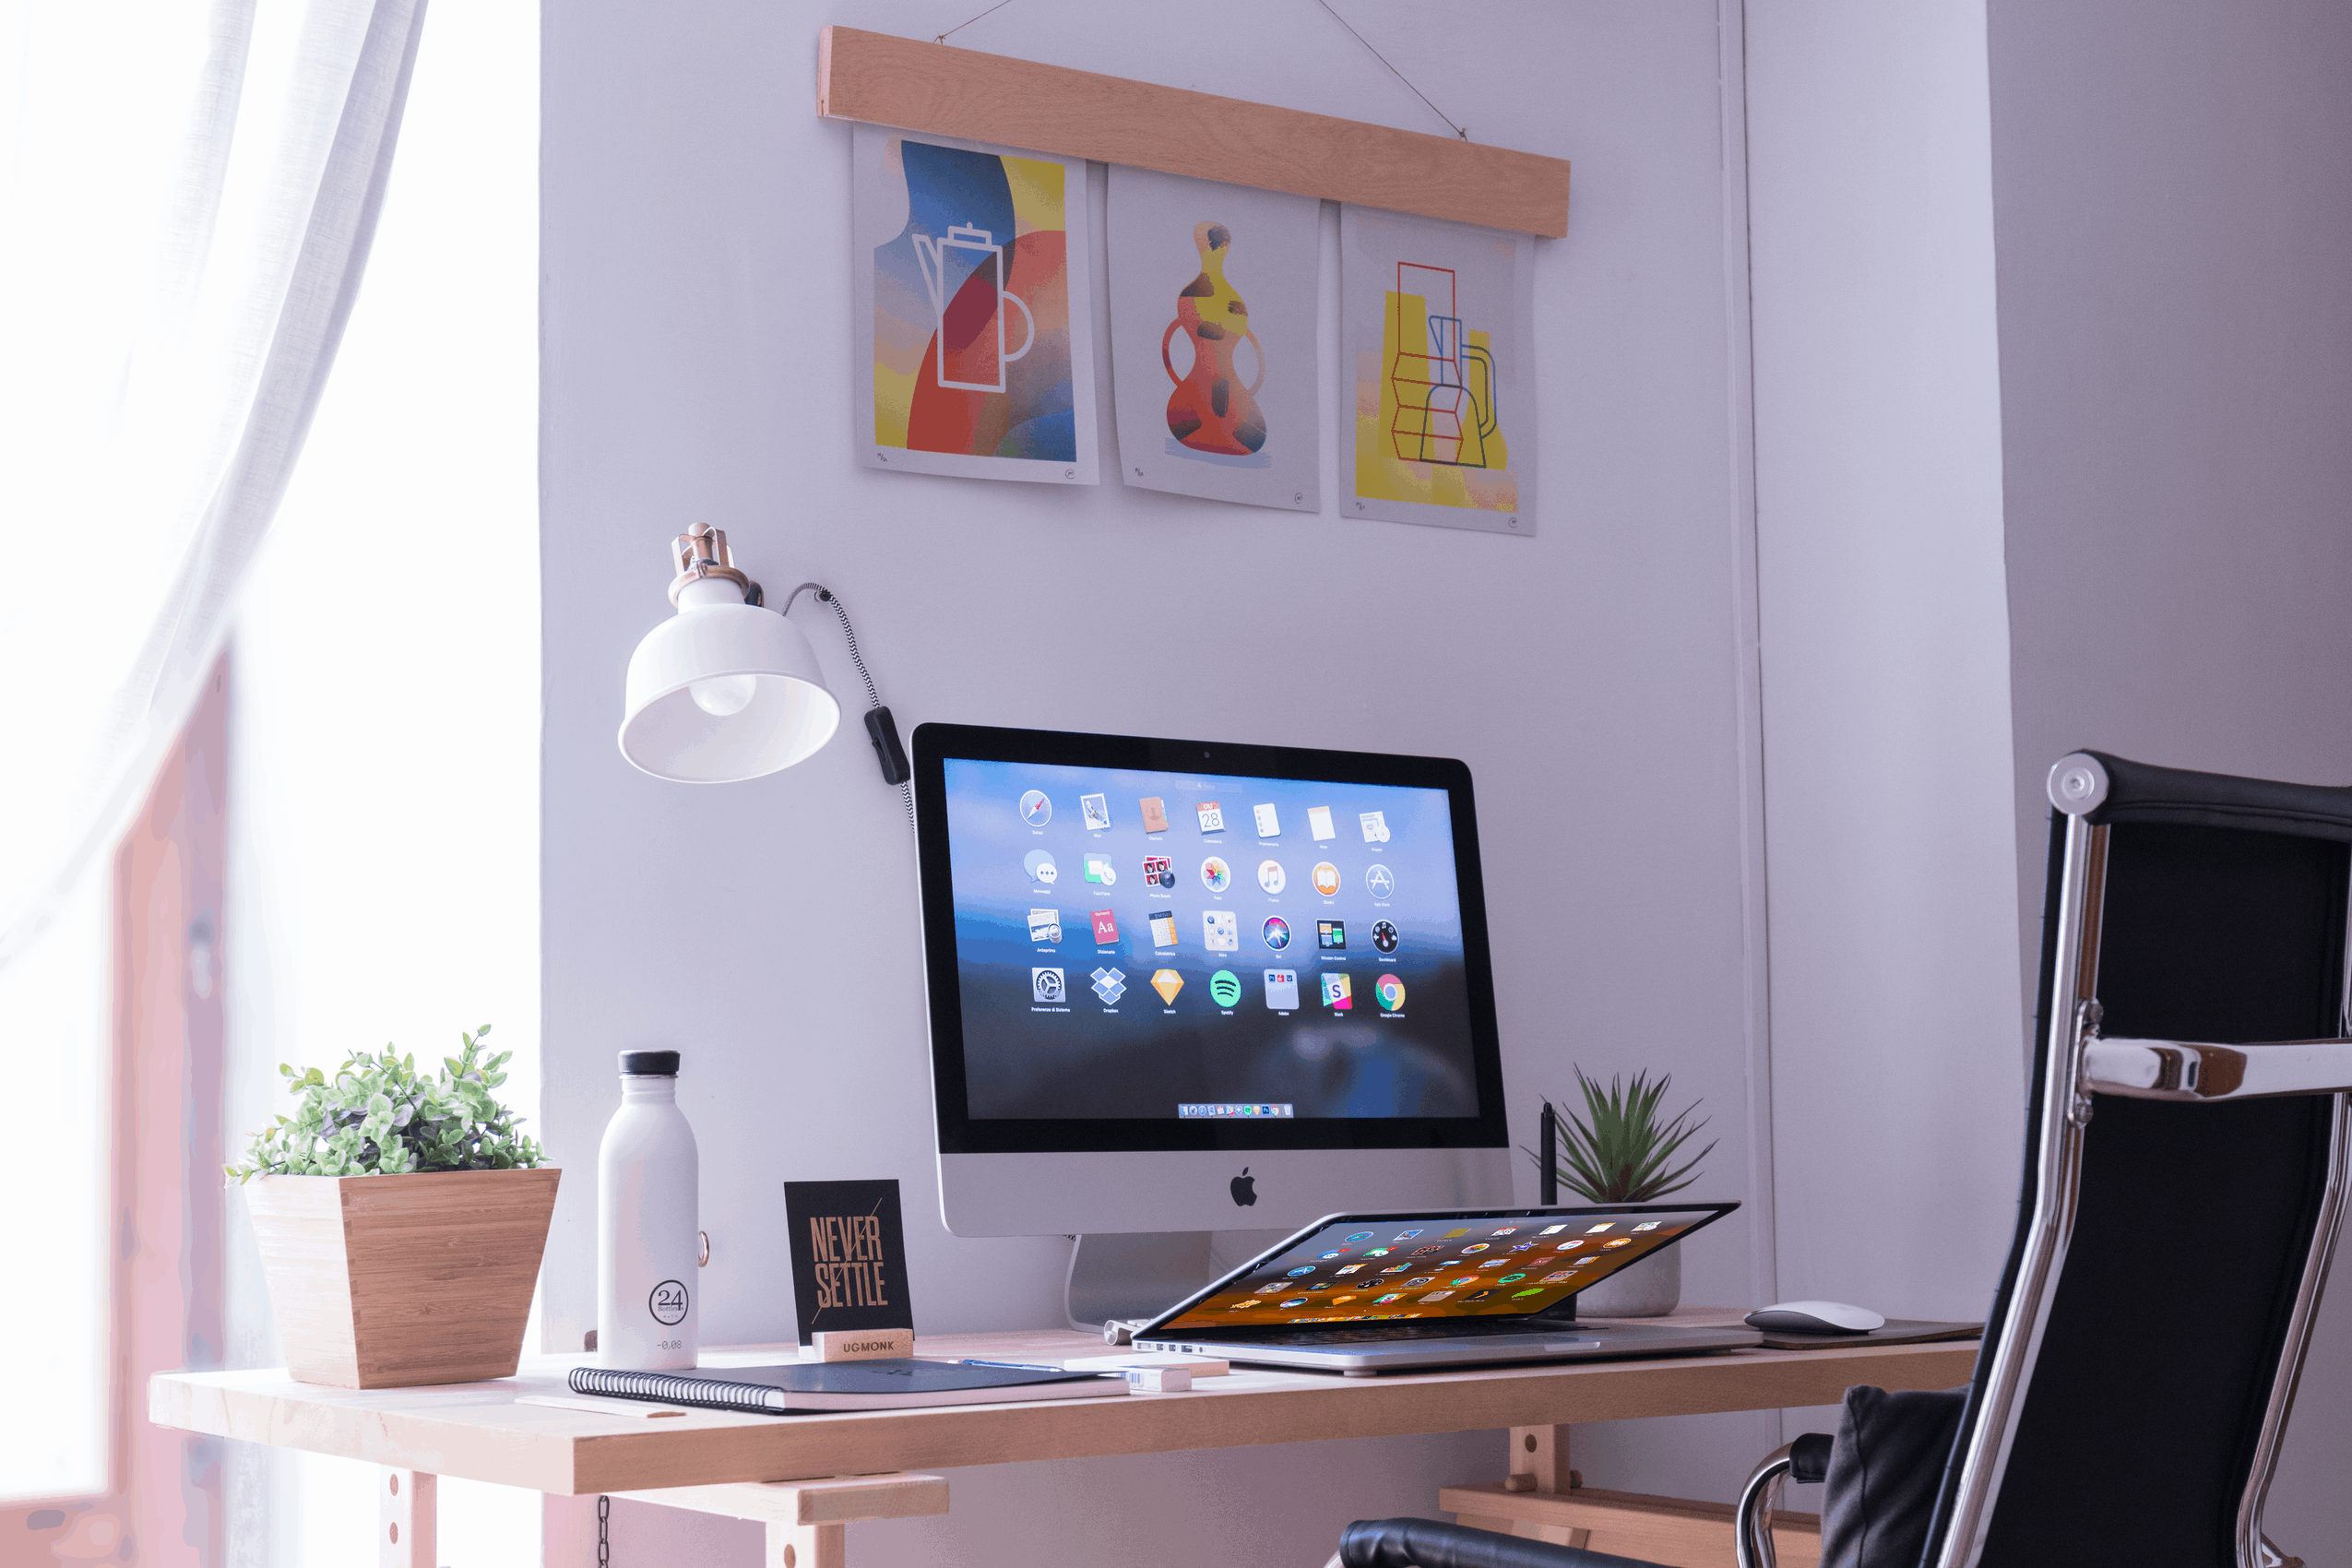 Computer desk photo for productivity article